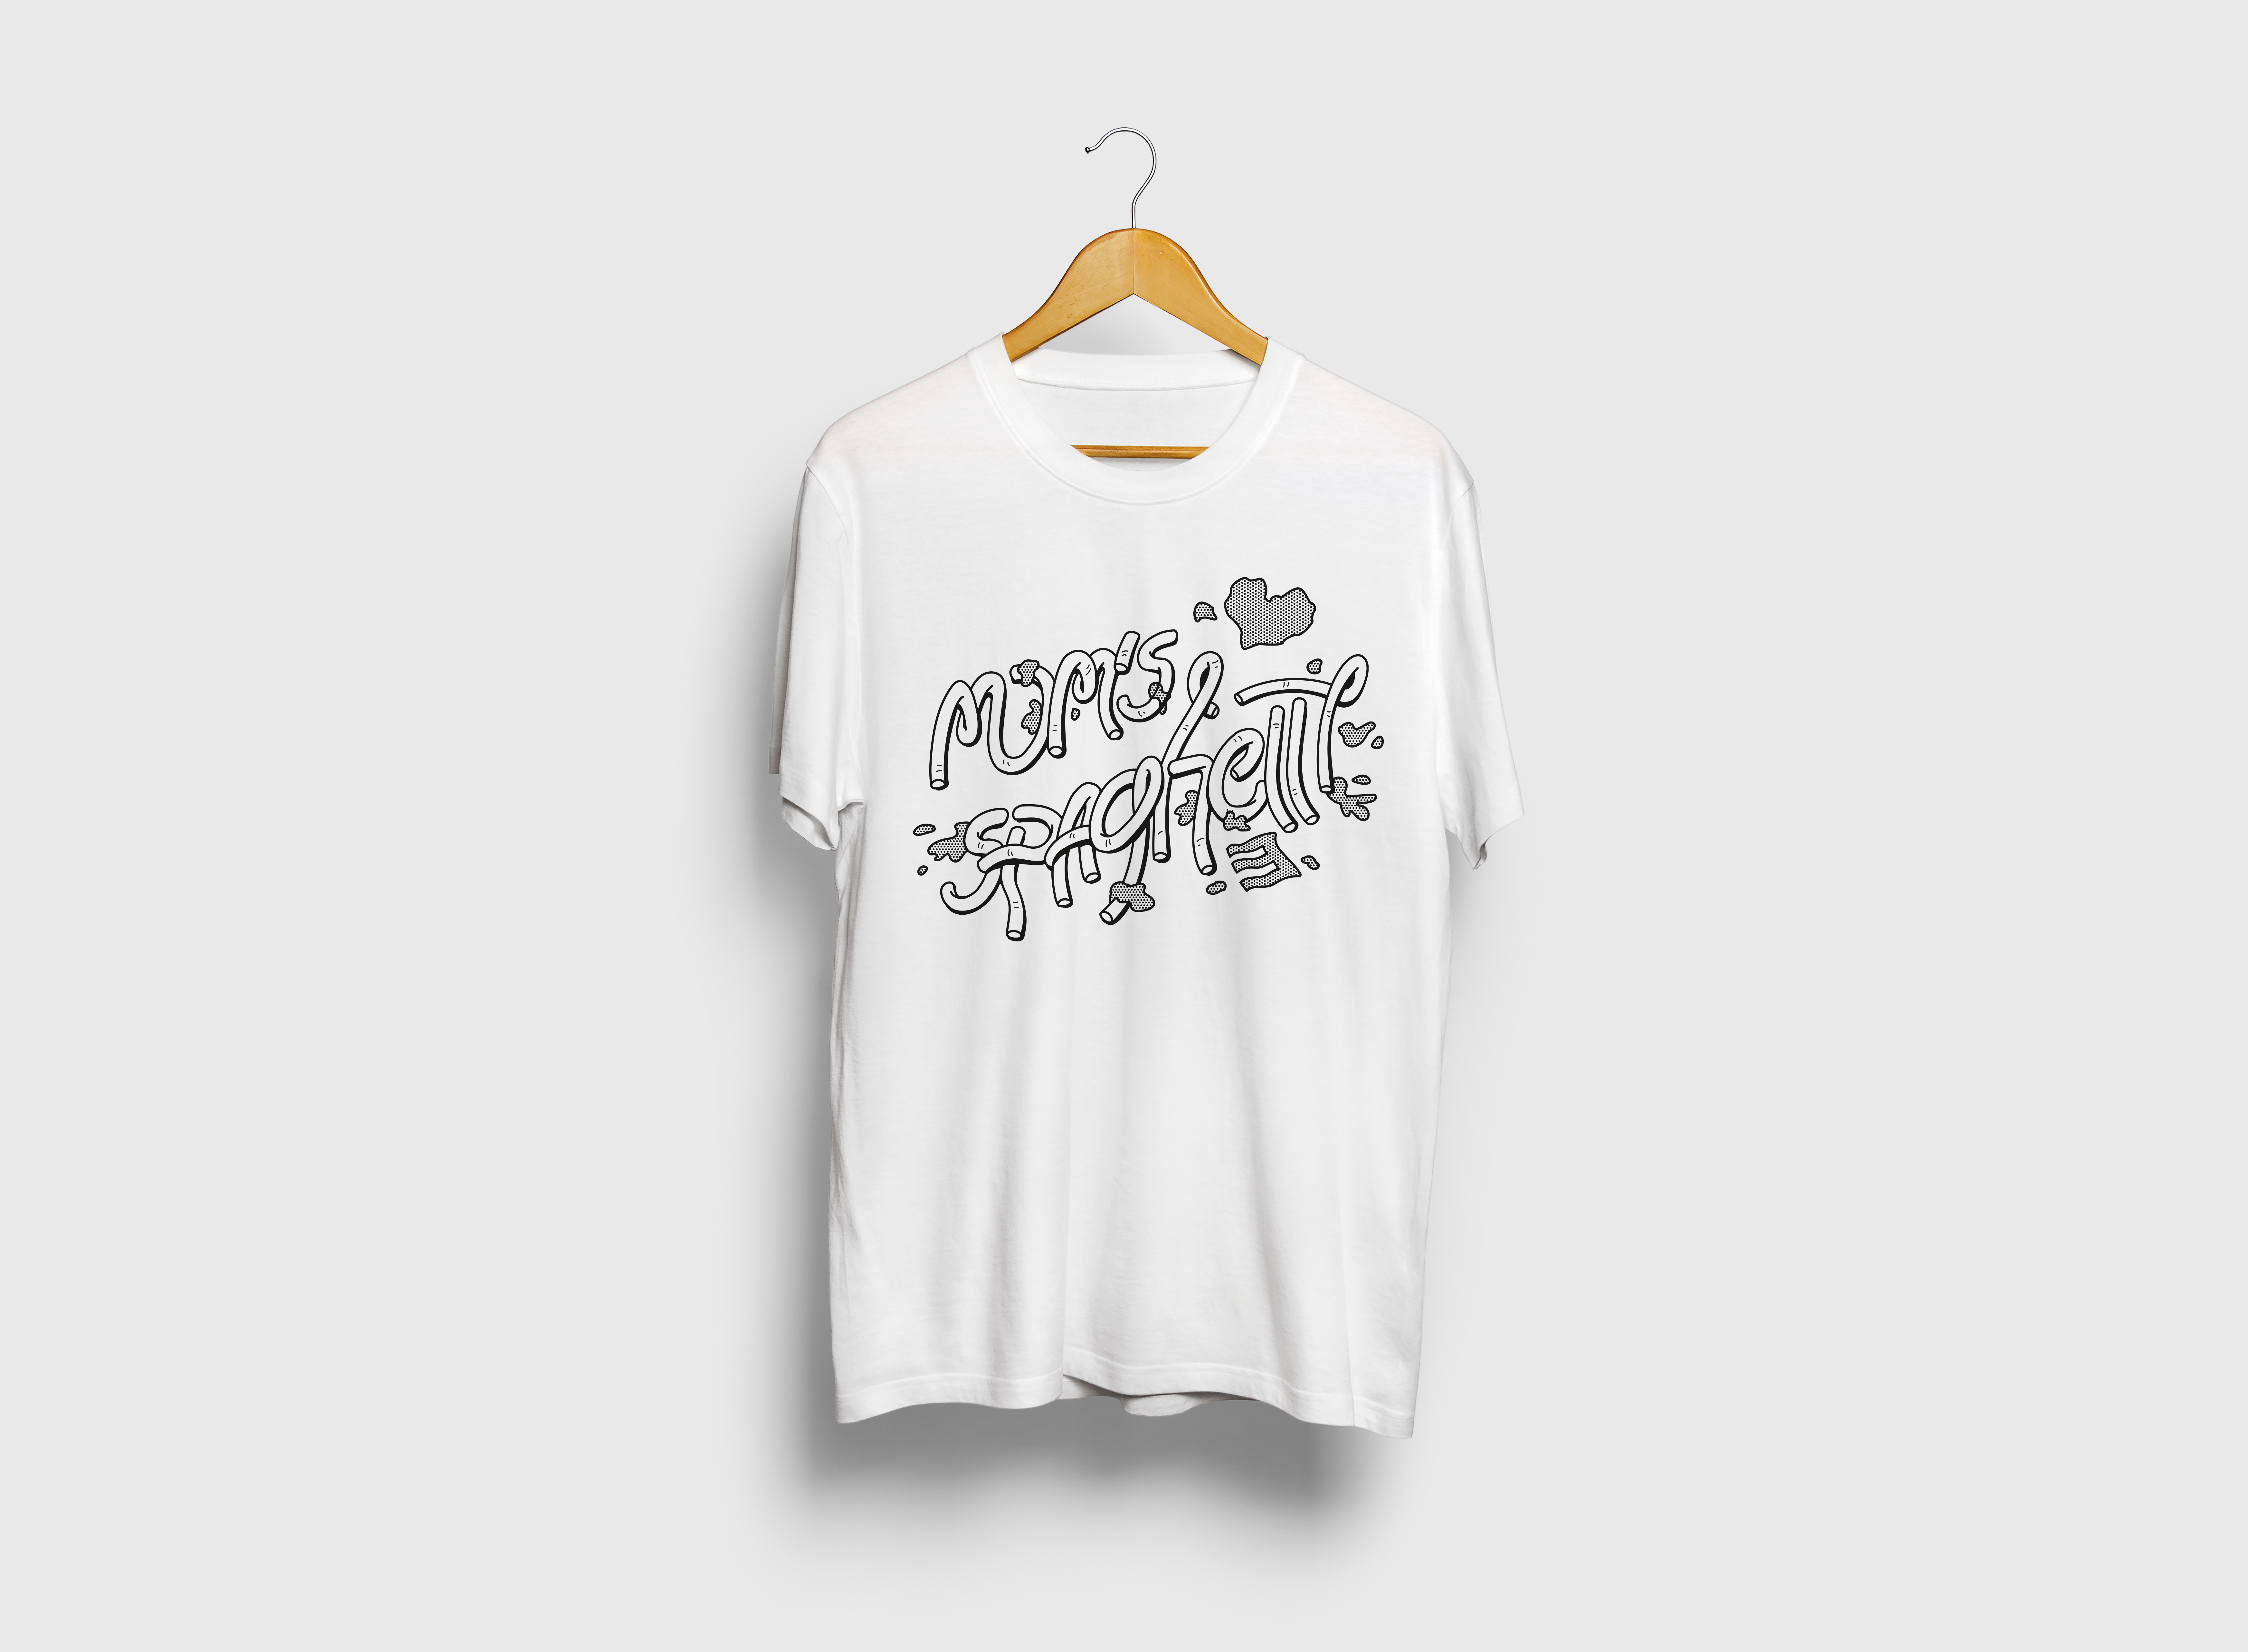 Moms_Spaghetti_Shirt